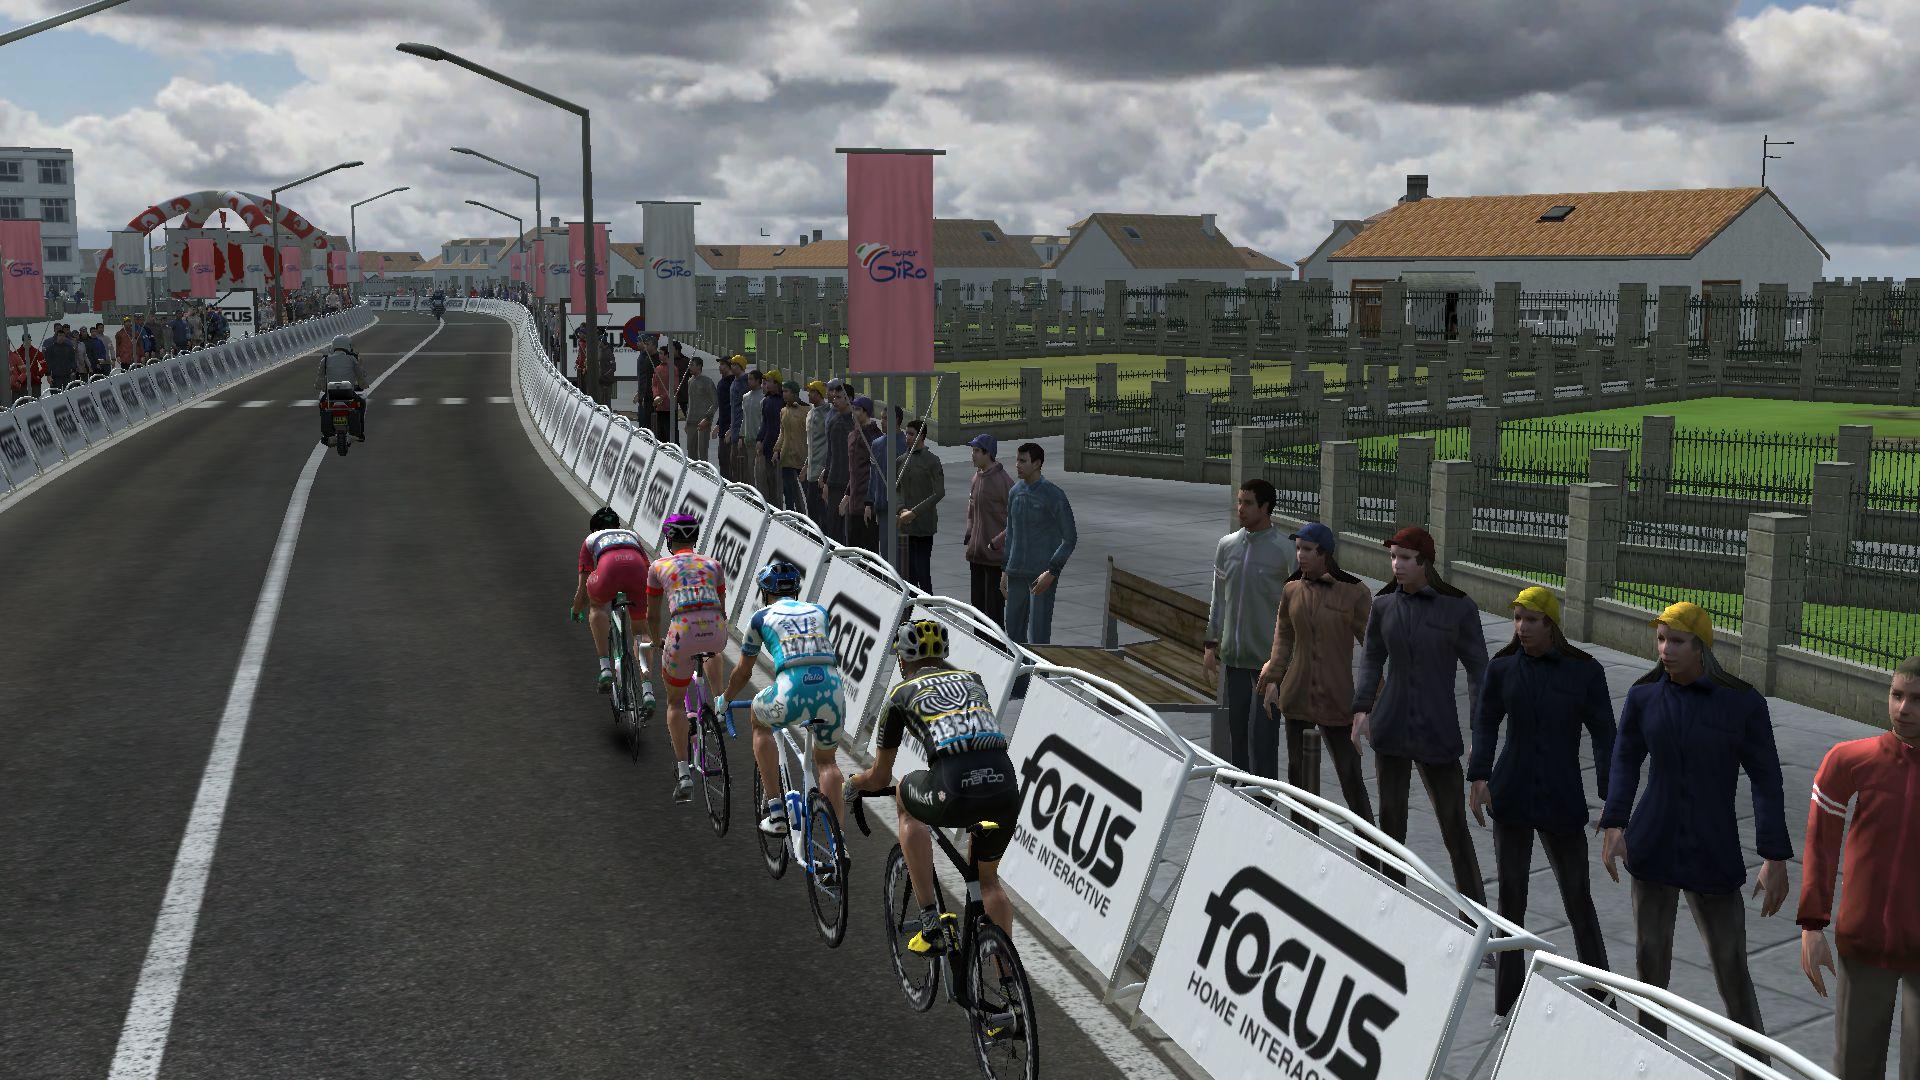 pcmdaily.com/images/mg/2019/Races/GTM/Giro/mg19_giro_18_PCM0255.jpg